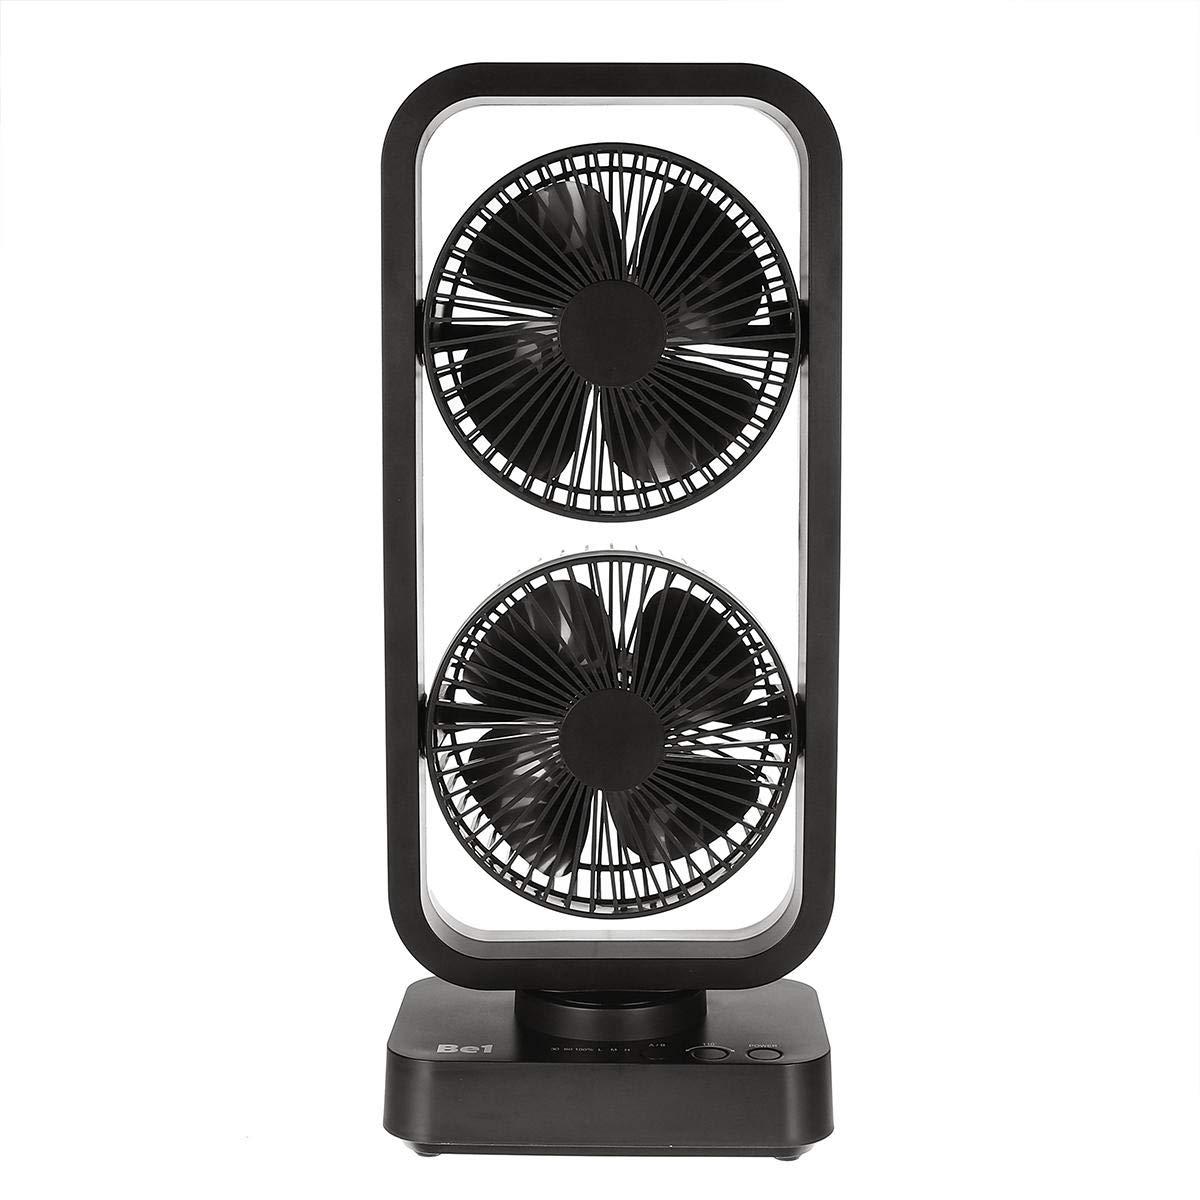 F.S.M. Mini Portable USB Cooling Air Fan Double Tower Fan 10000mAh Rechargeable Home Desk Fan - Black + Blue by F.S.M.